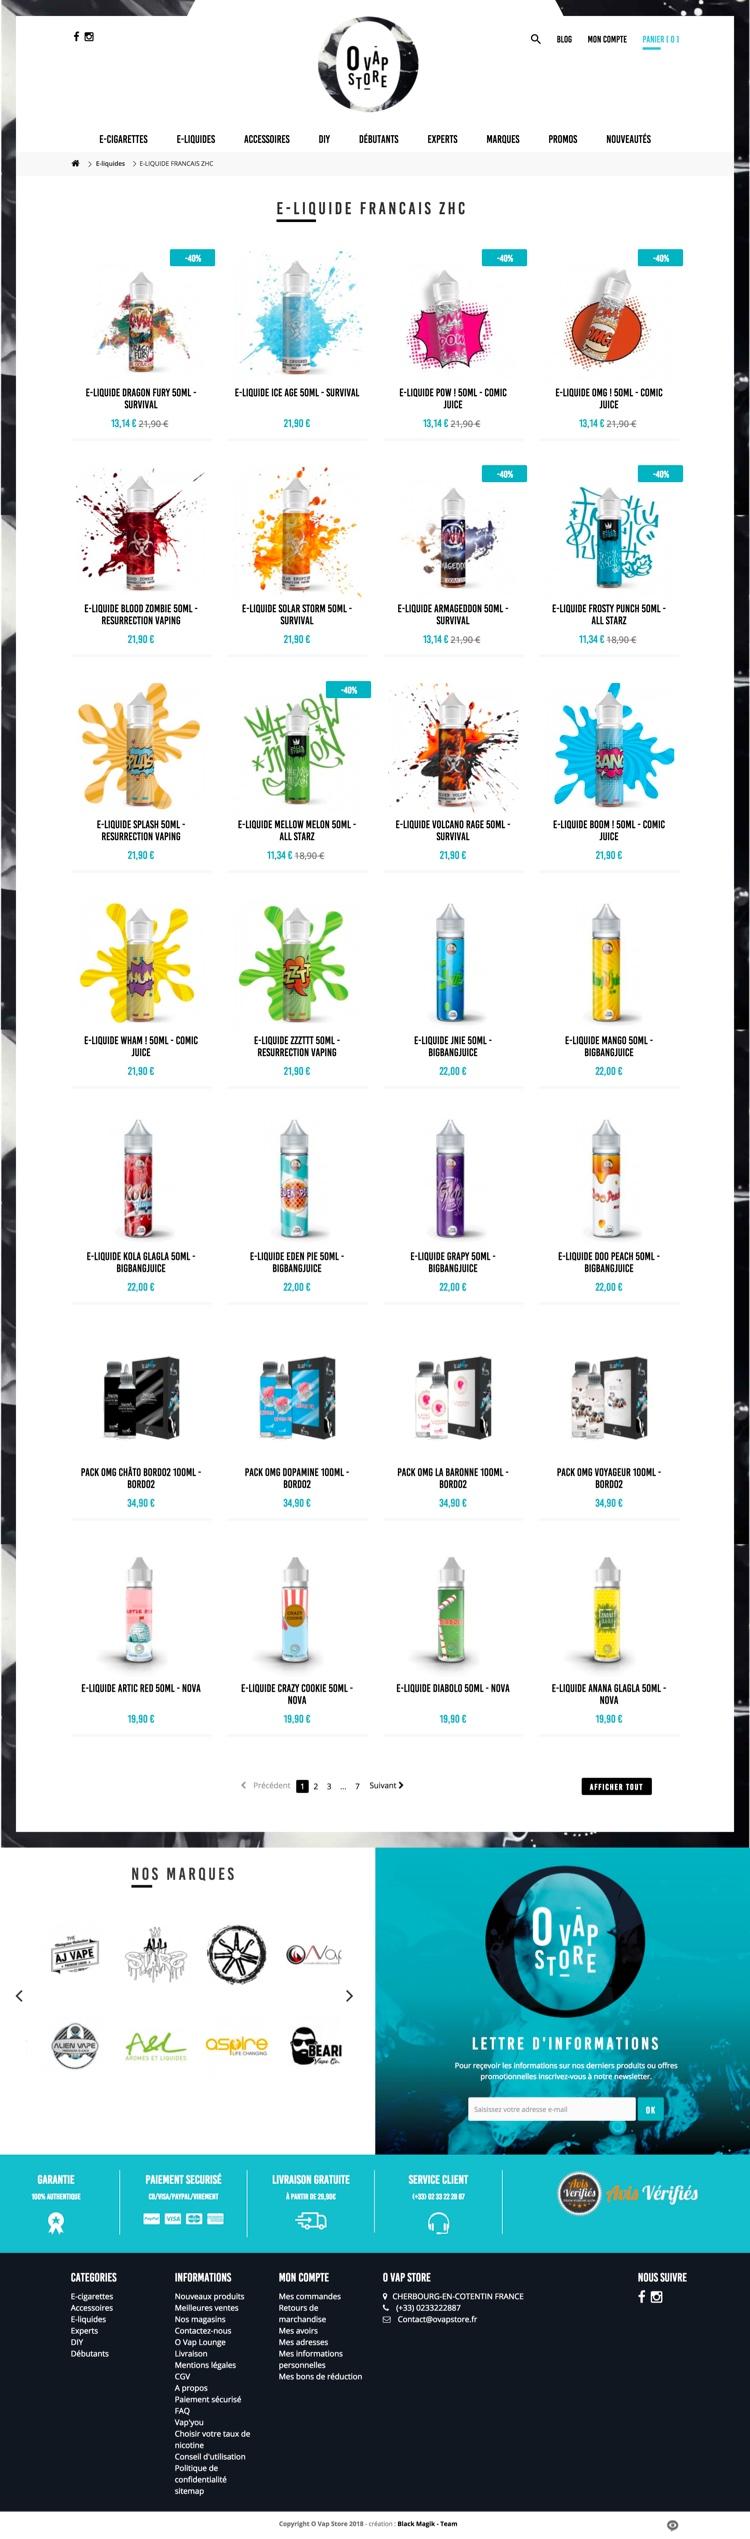 Création site internet - O'Vap Store